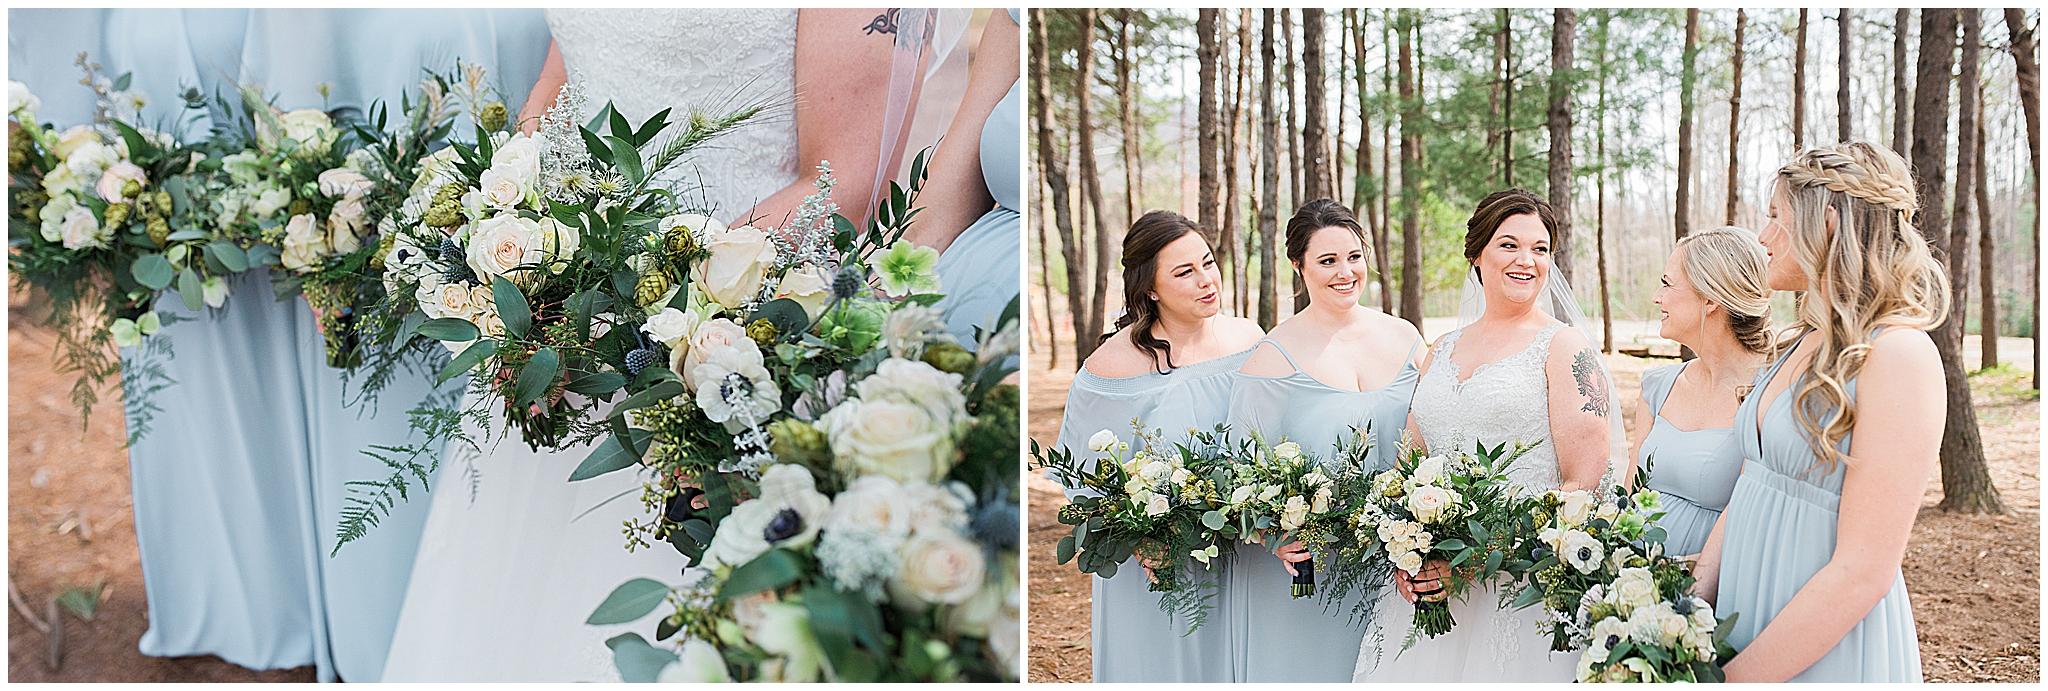 Wedding_Photographer_Asheville_Highland_Brewing_0009.jpg